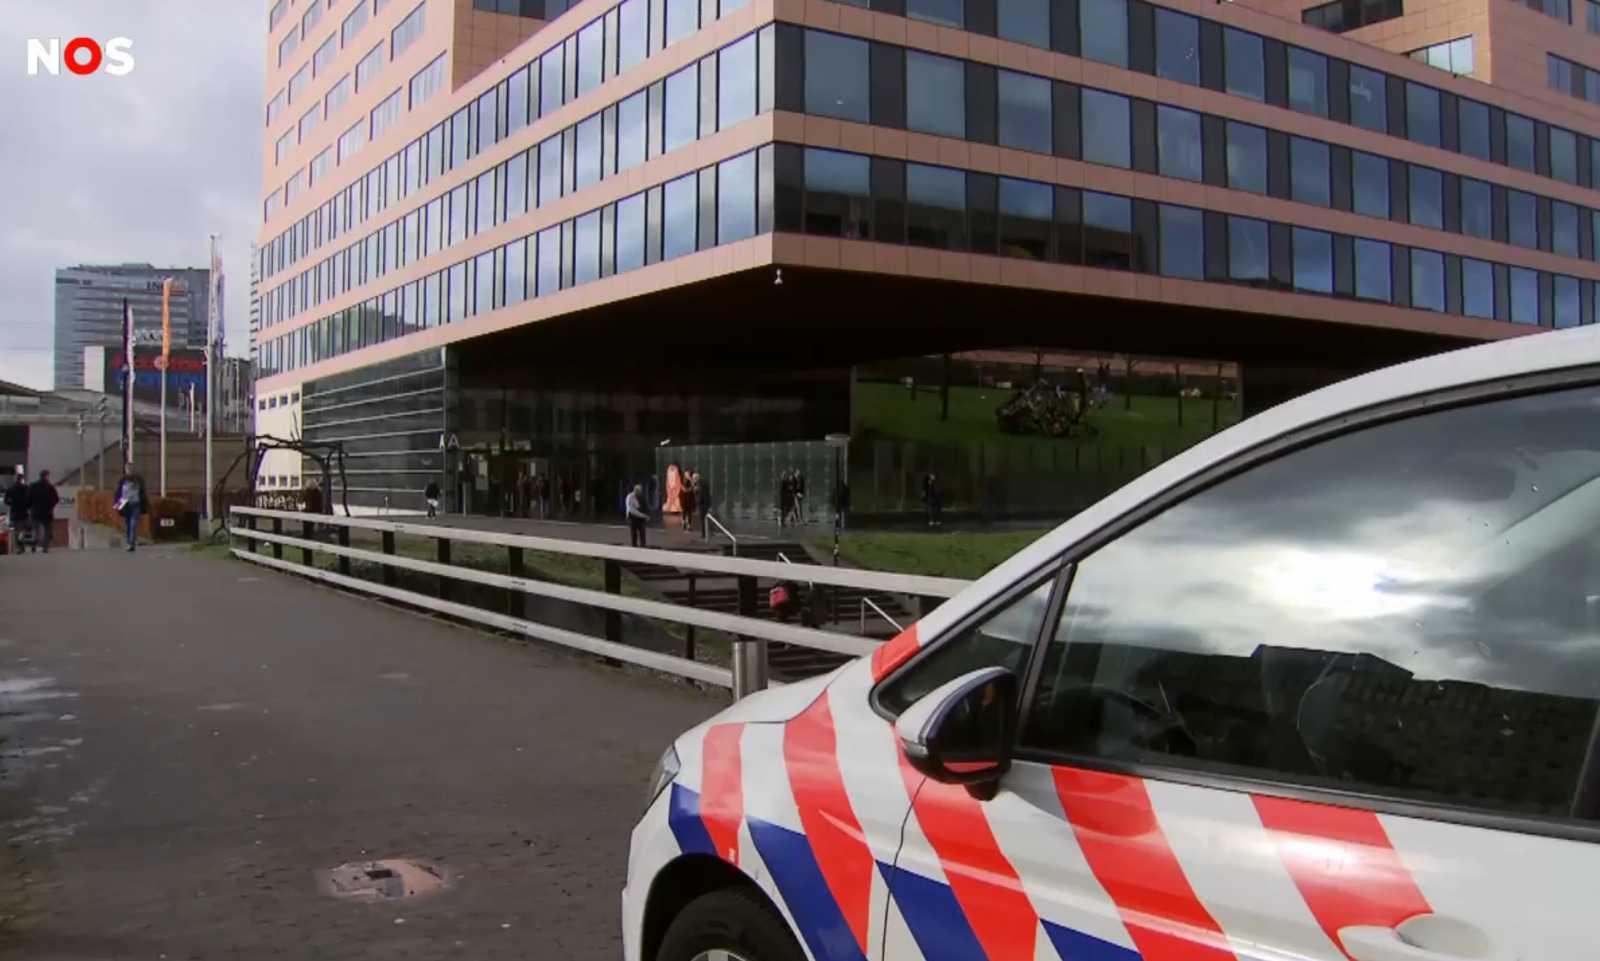 Здание штаб-квартиры ING в Amsterdam Zuidoost. Кадр из видео NOS.